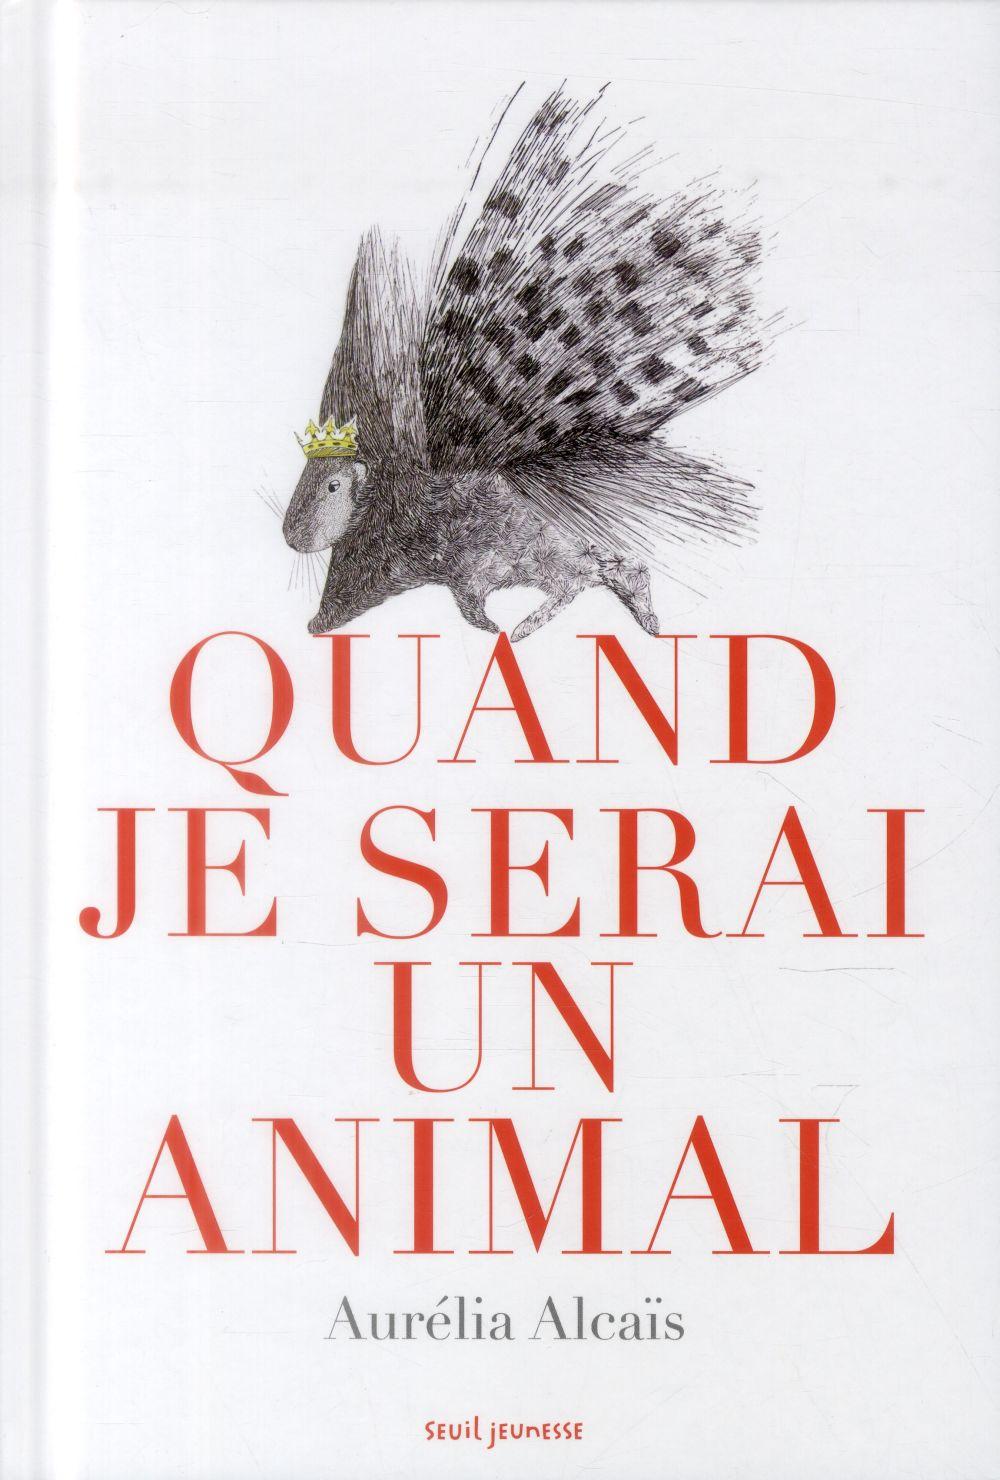 QUAND JE SERAI UN ANIMAL